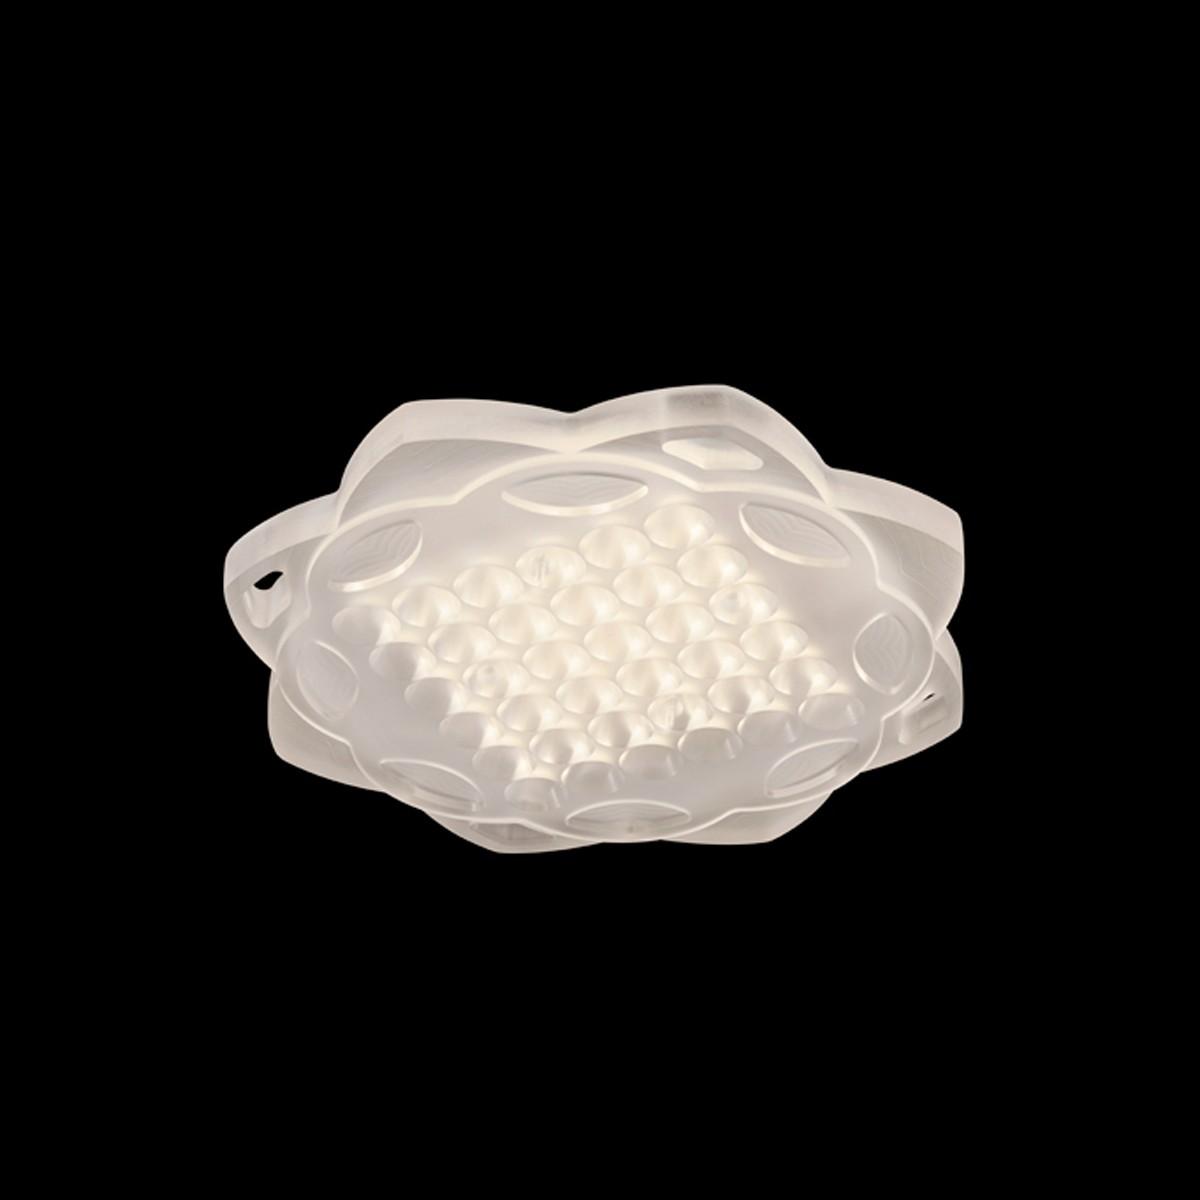 Nimbus Marie 36 Deckenleuchte, 3000K, Acrylglas